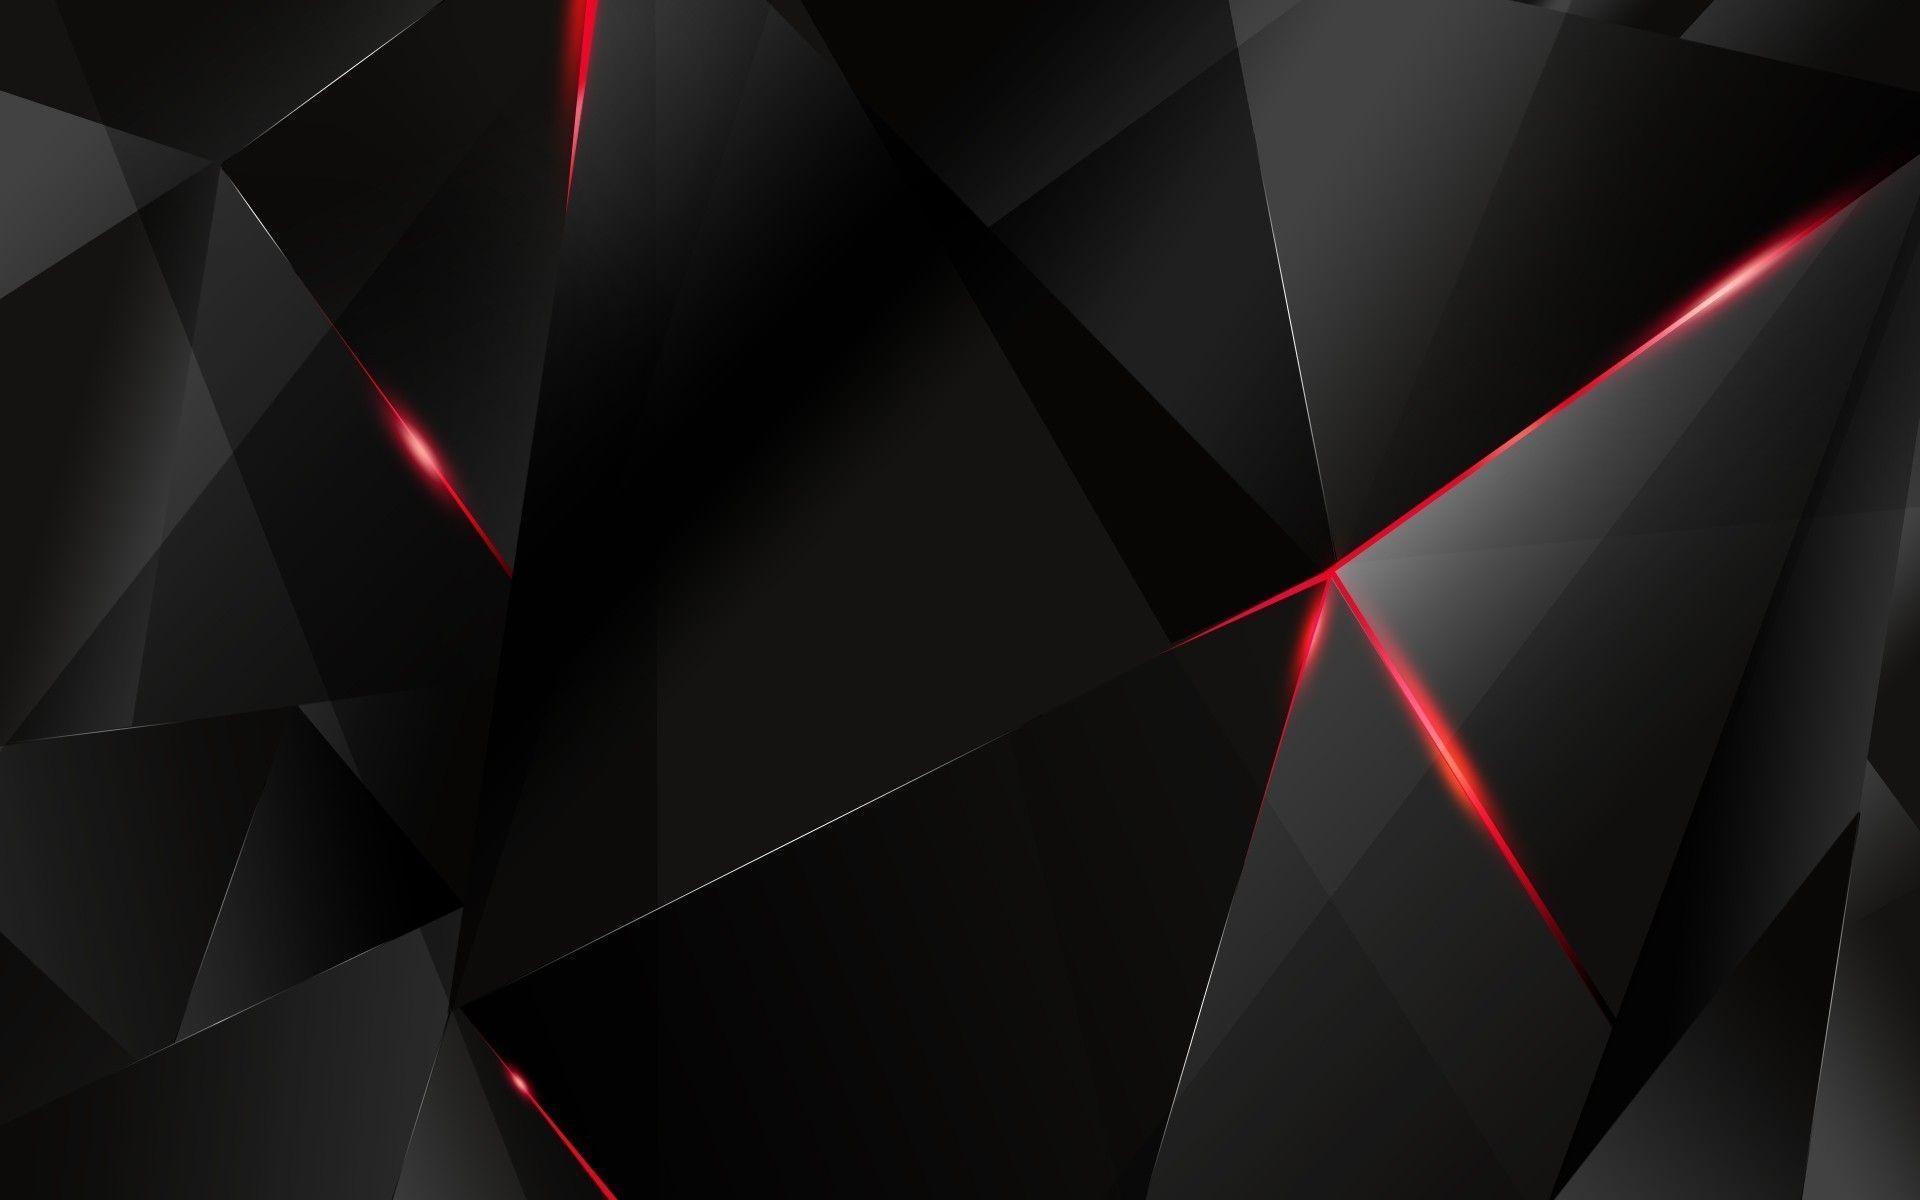 Red Desktop Backgrounds - Wallpaper Cave